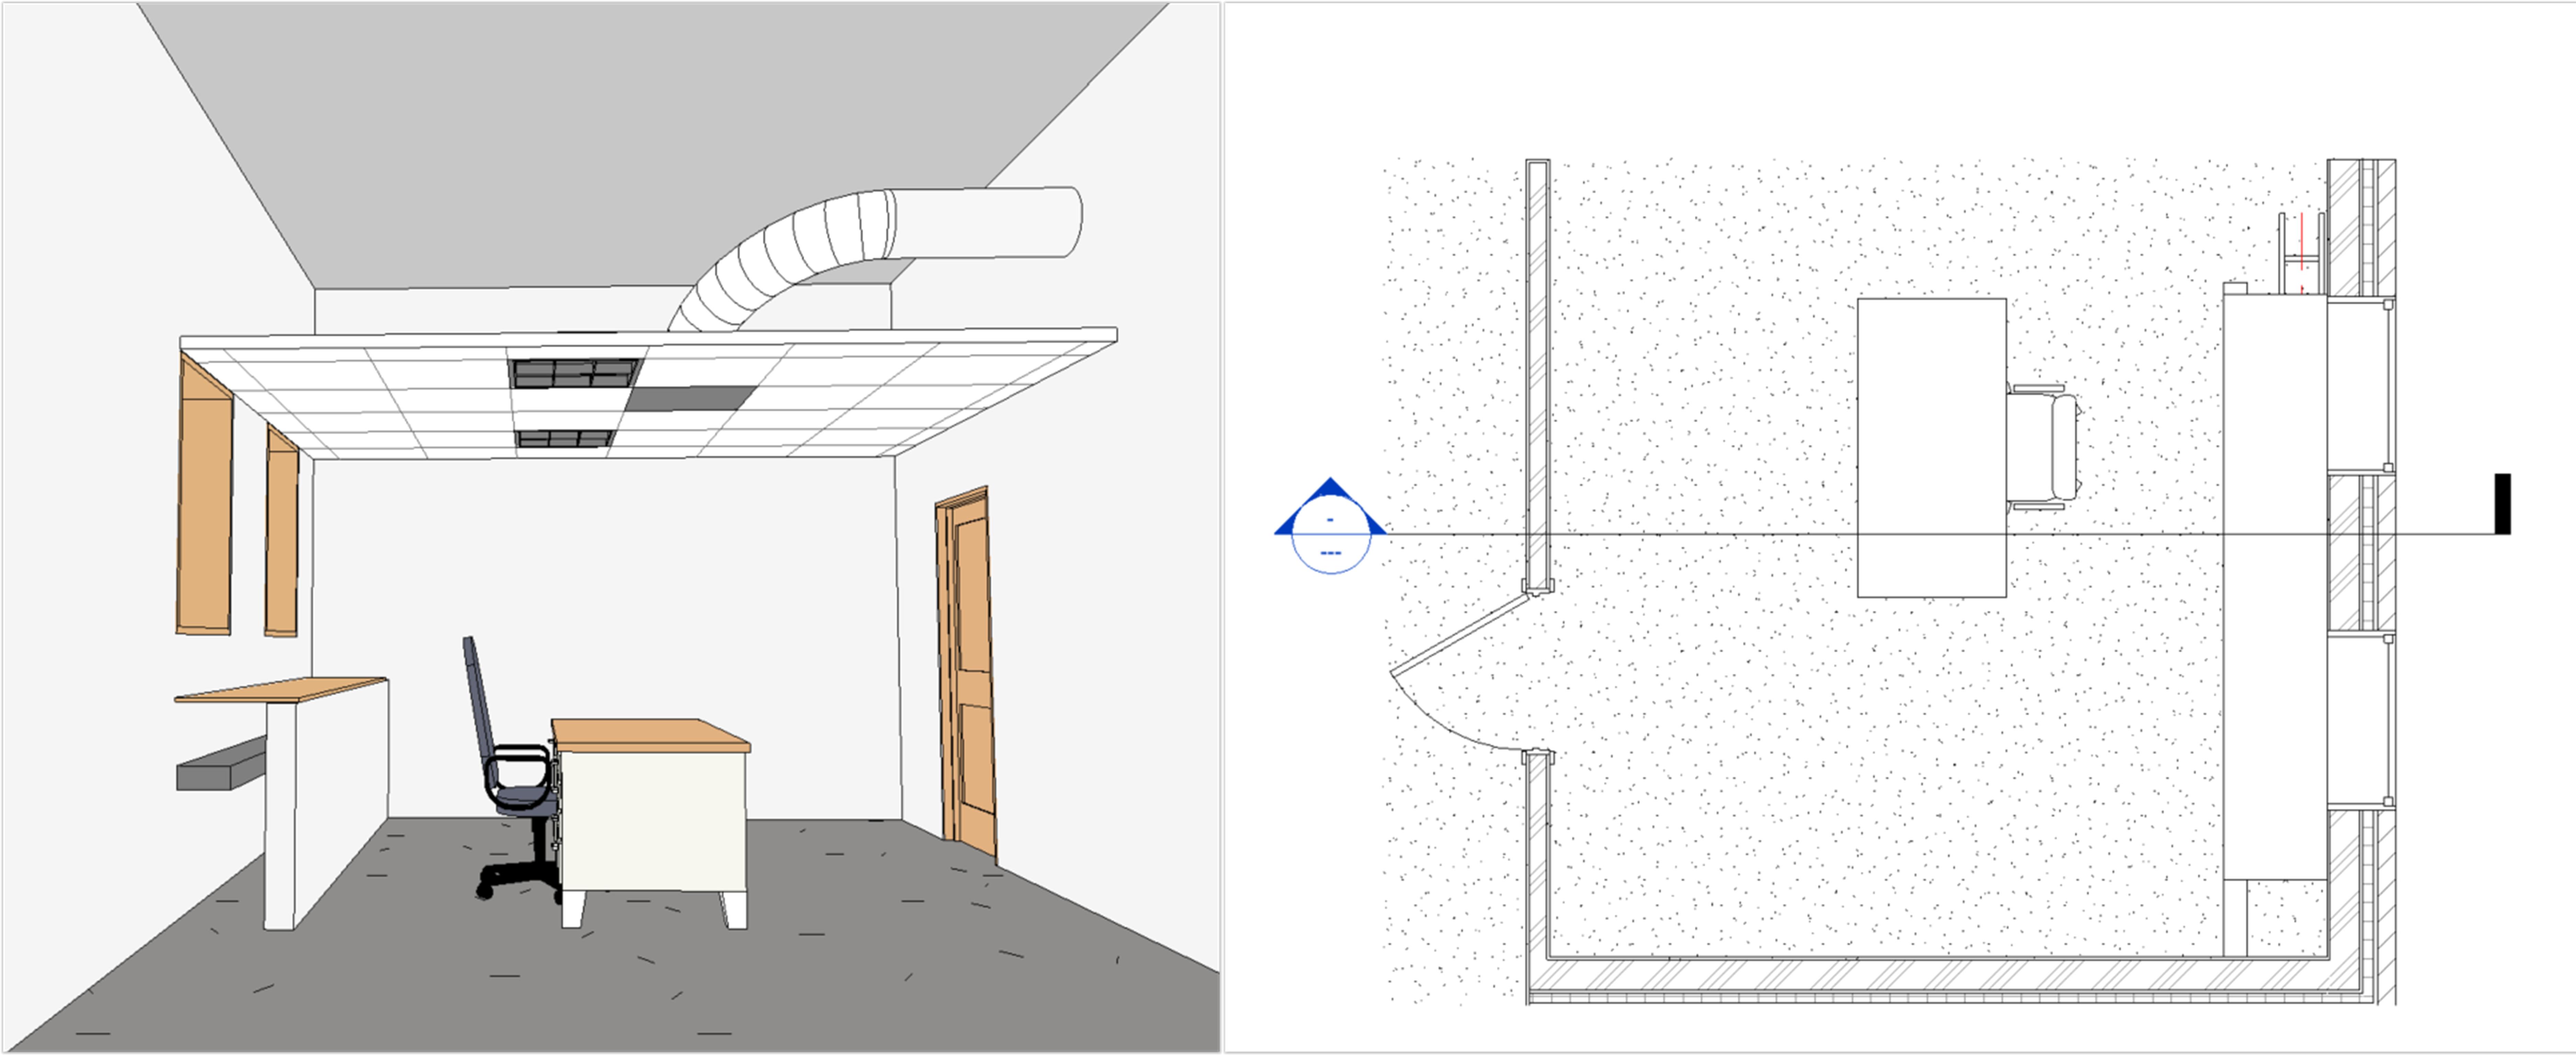 Dziedzina widoku Architektura 3D i rzut